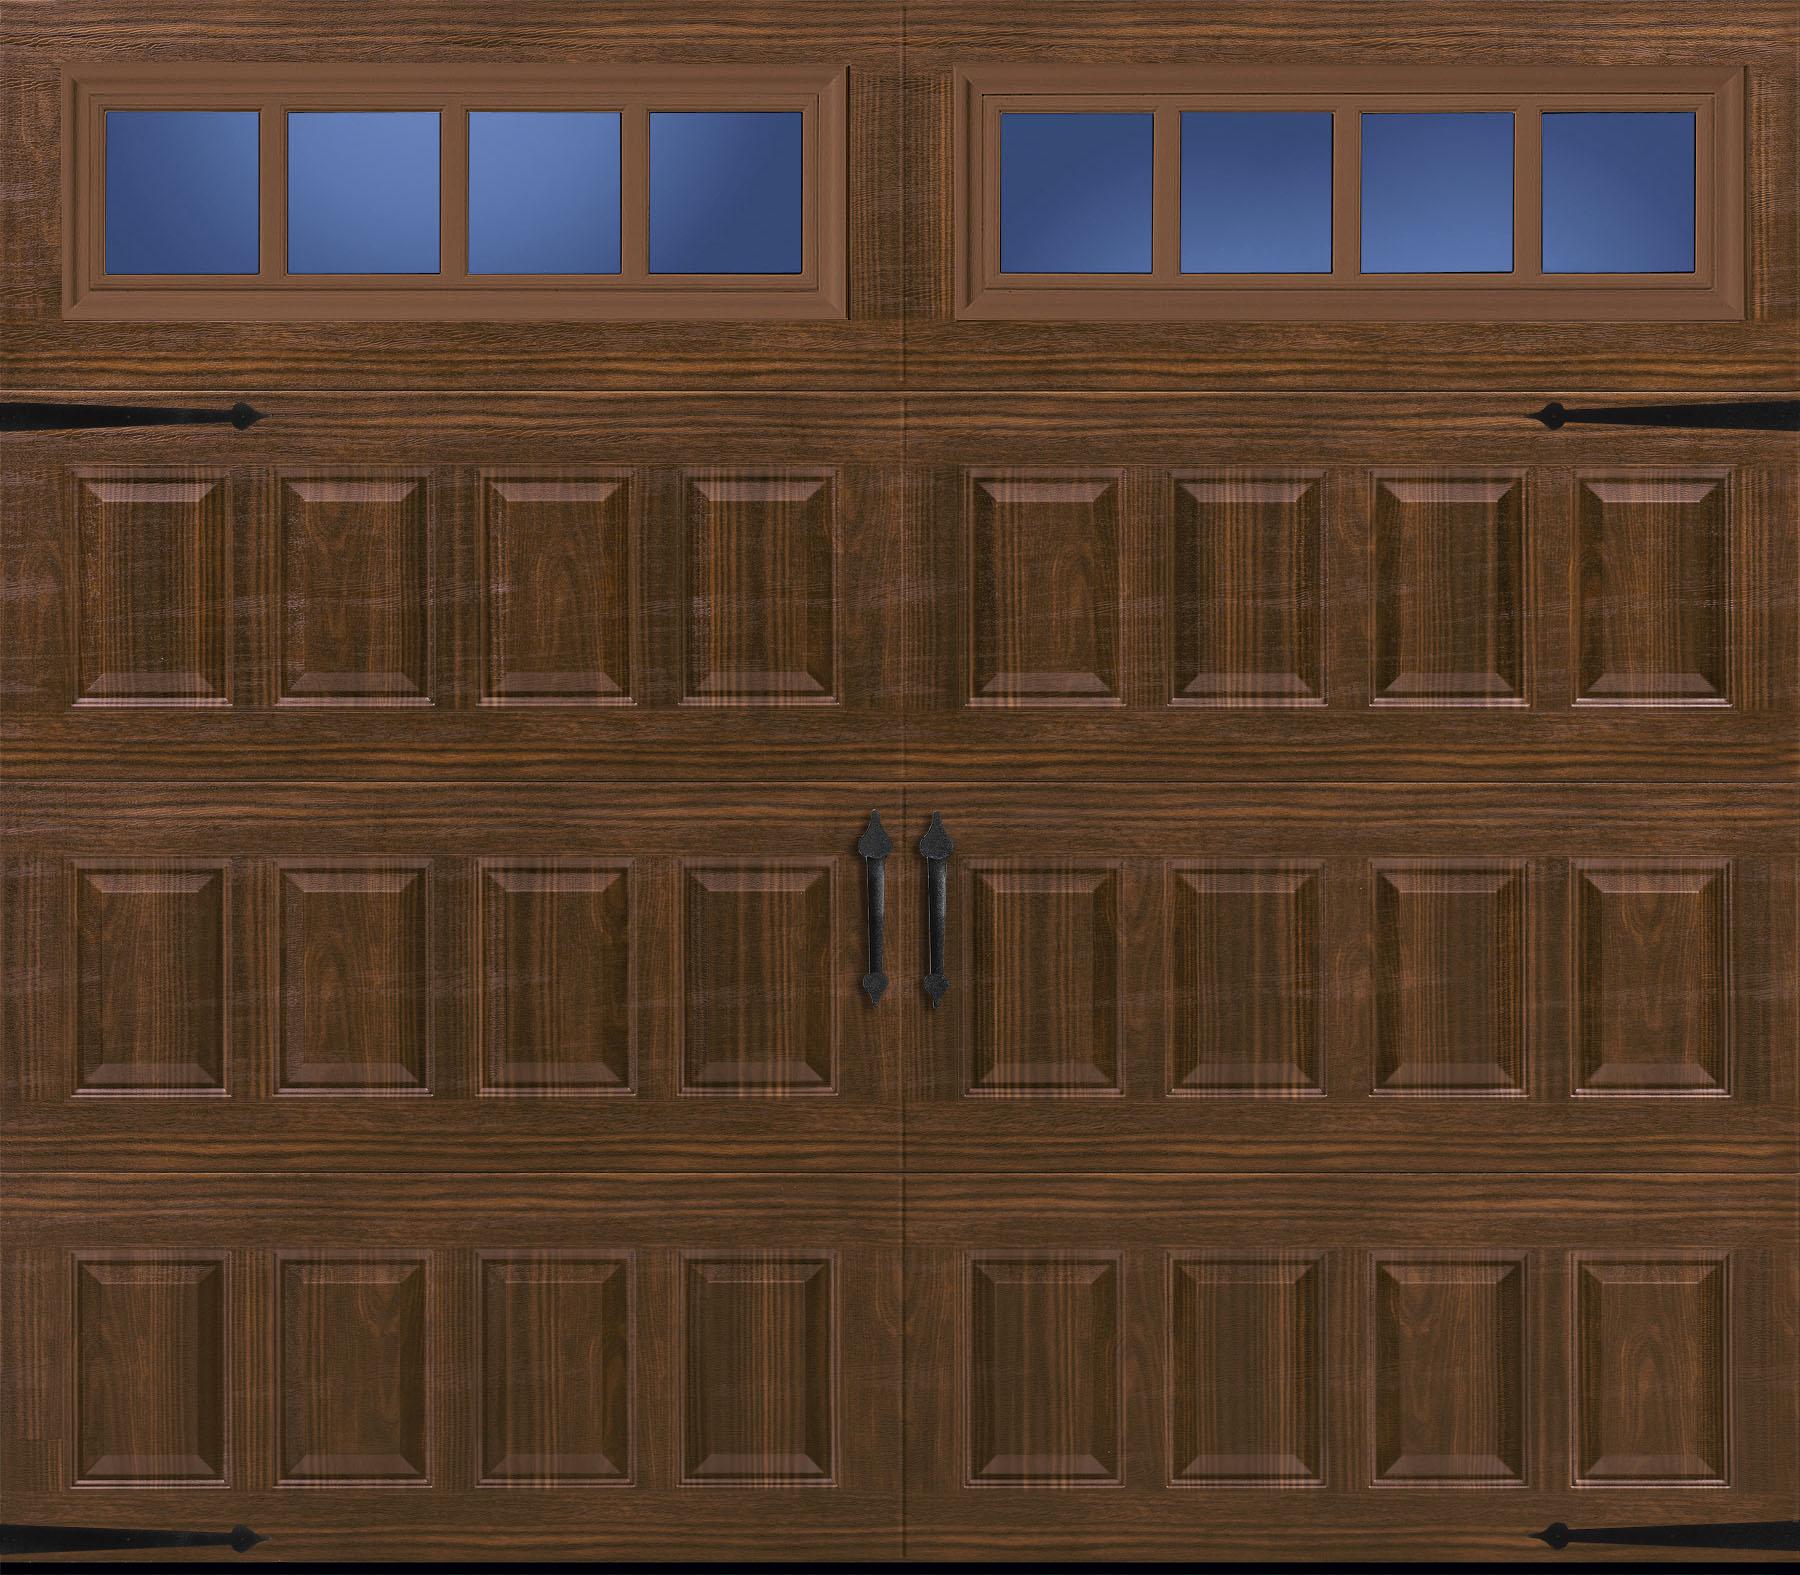 amarr carriage house hillcrest raised short panel walnut long panel thames windows rw garage doors